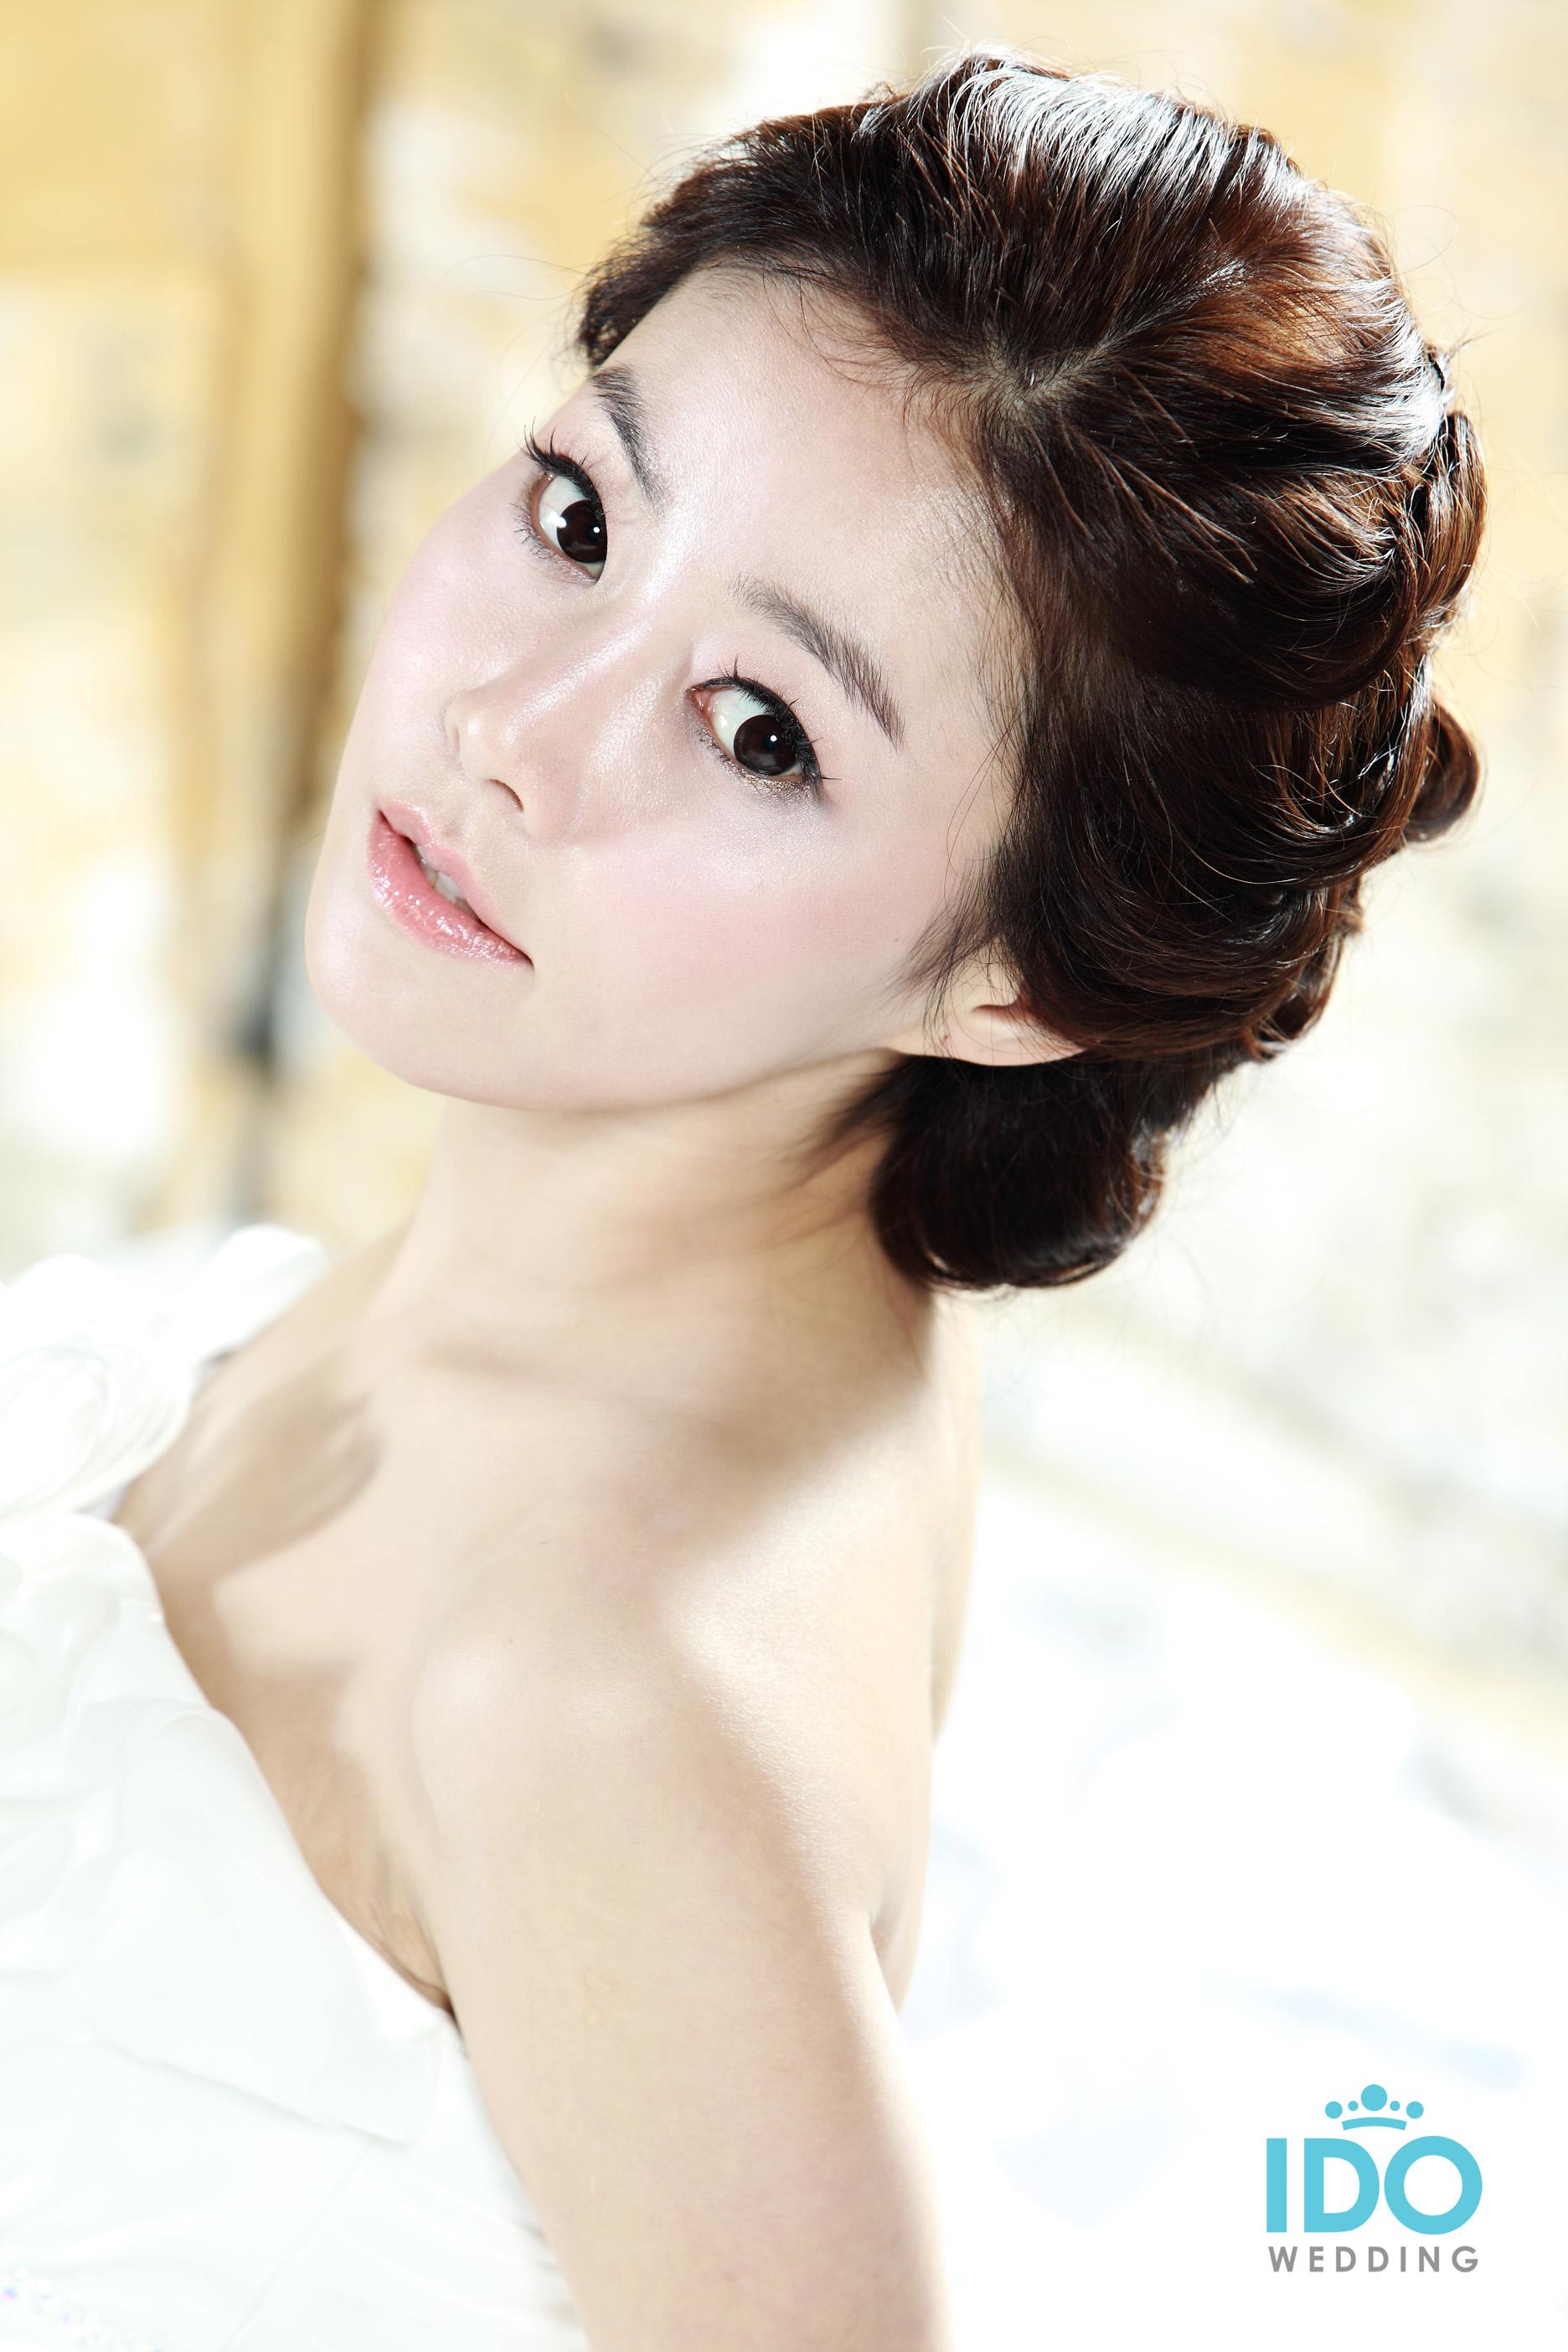 Bridal Hairstyle Korean: Korean bridal hairstyles wedding stuff.